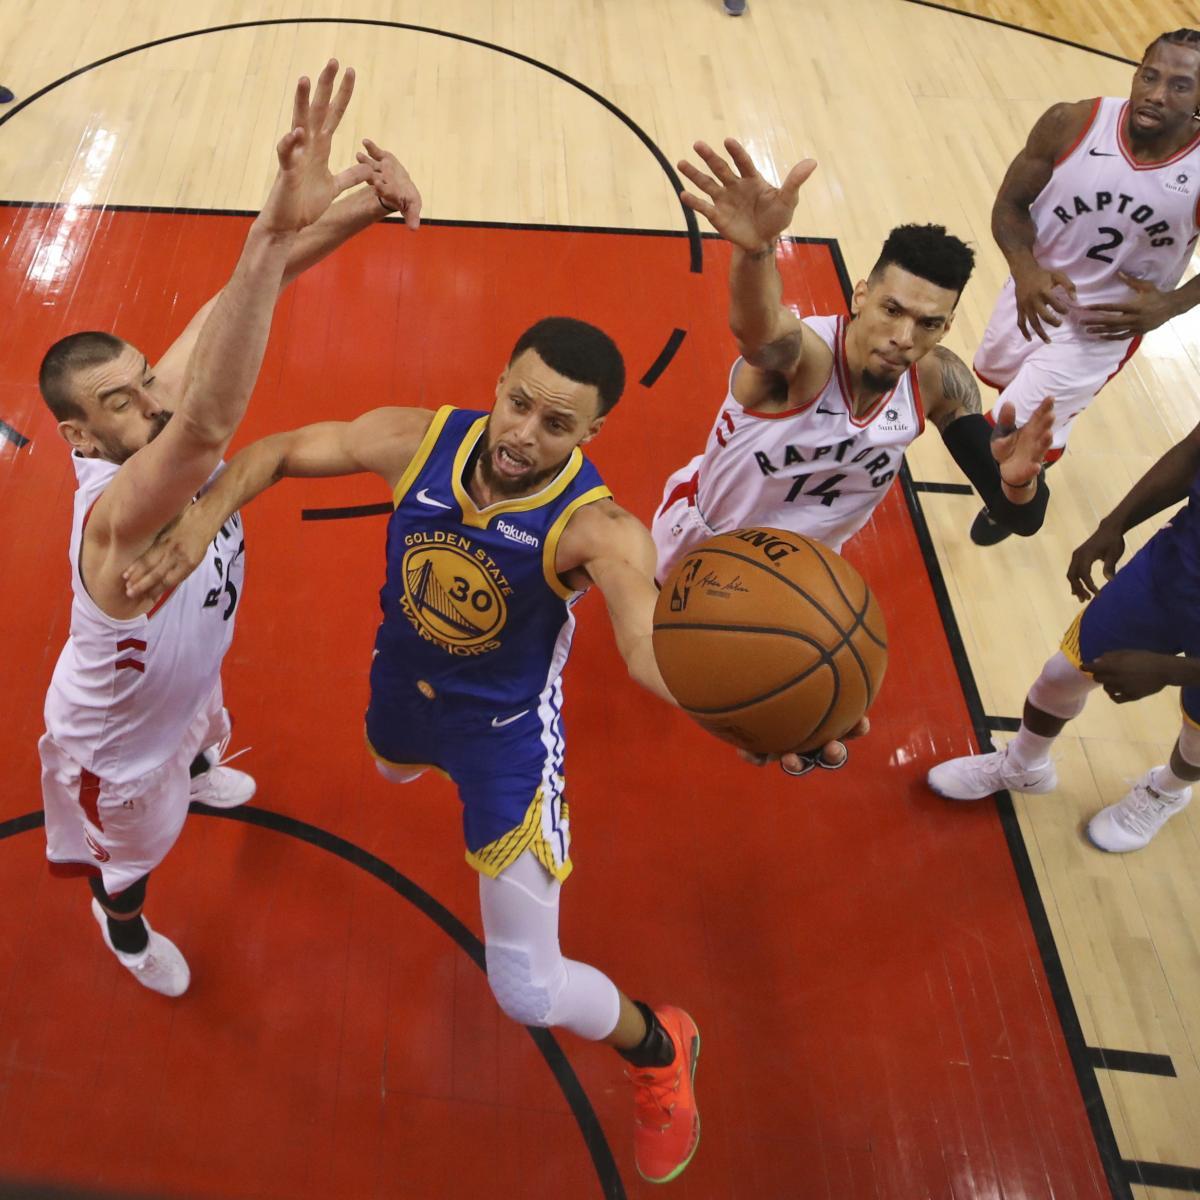 NBA Finals 2019: Warriors Vs. Raptors Game 2 Vegas Odds